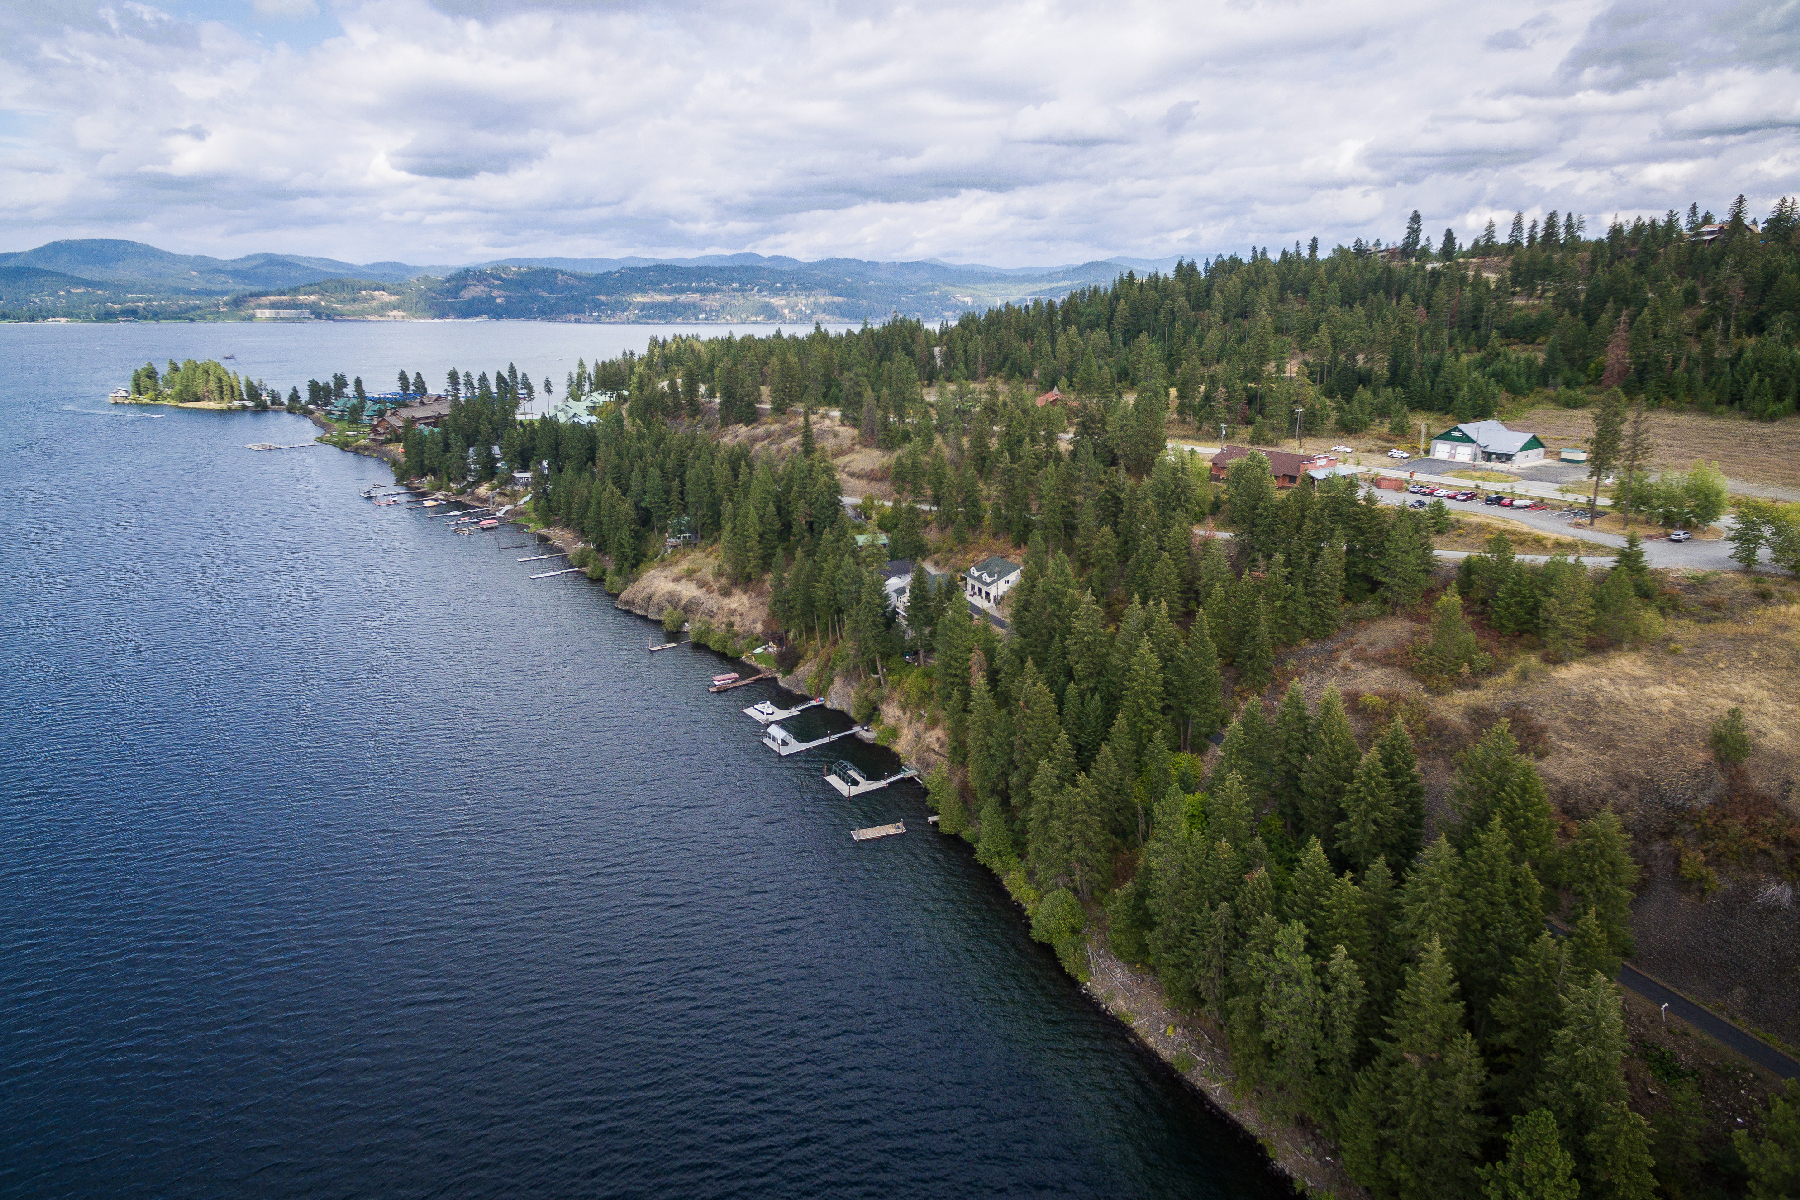 Terreno para Venda às Vacant Land with waterfront views 5445 S Catamaran Dr Harrison, Idaho, 83833 Estados Unidos